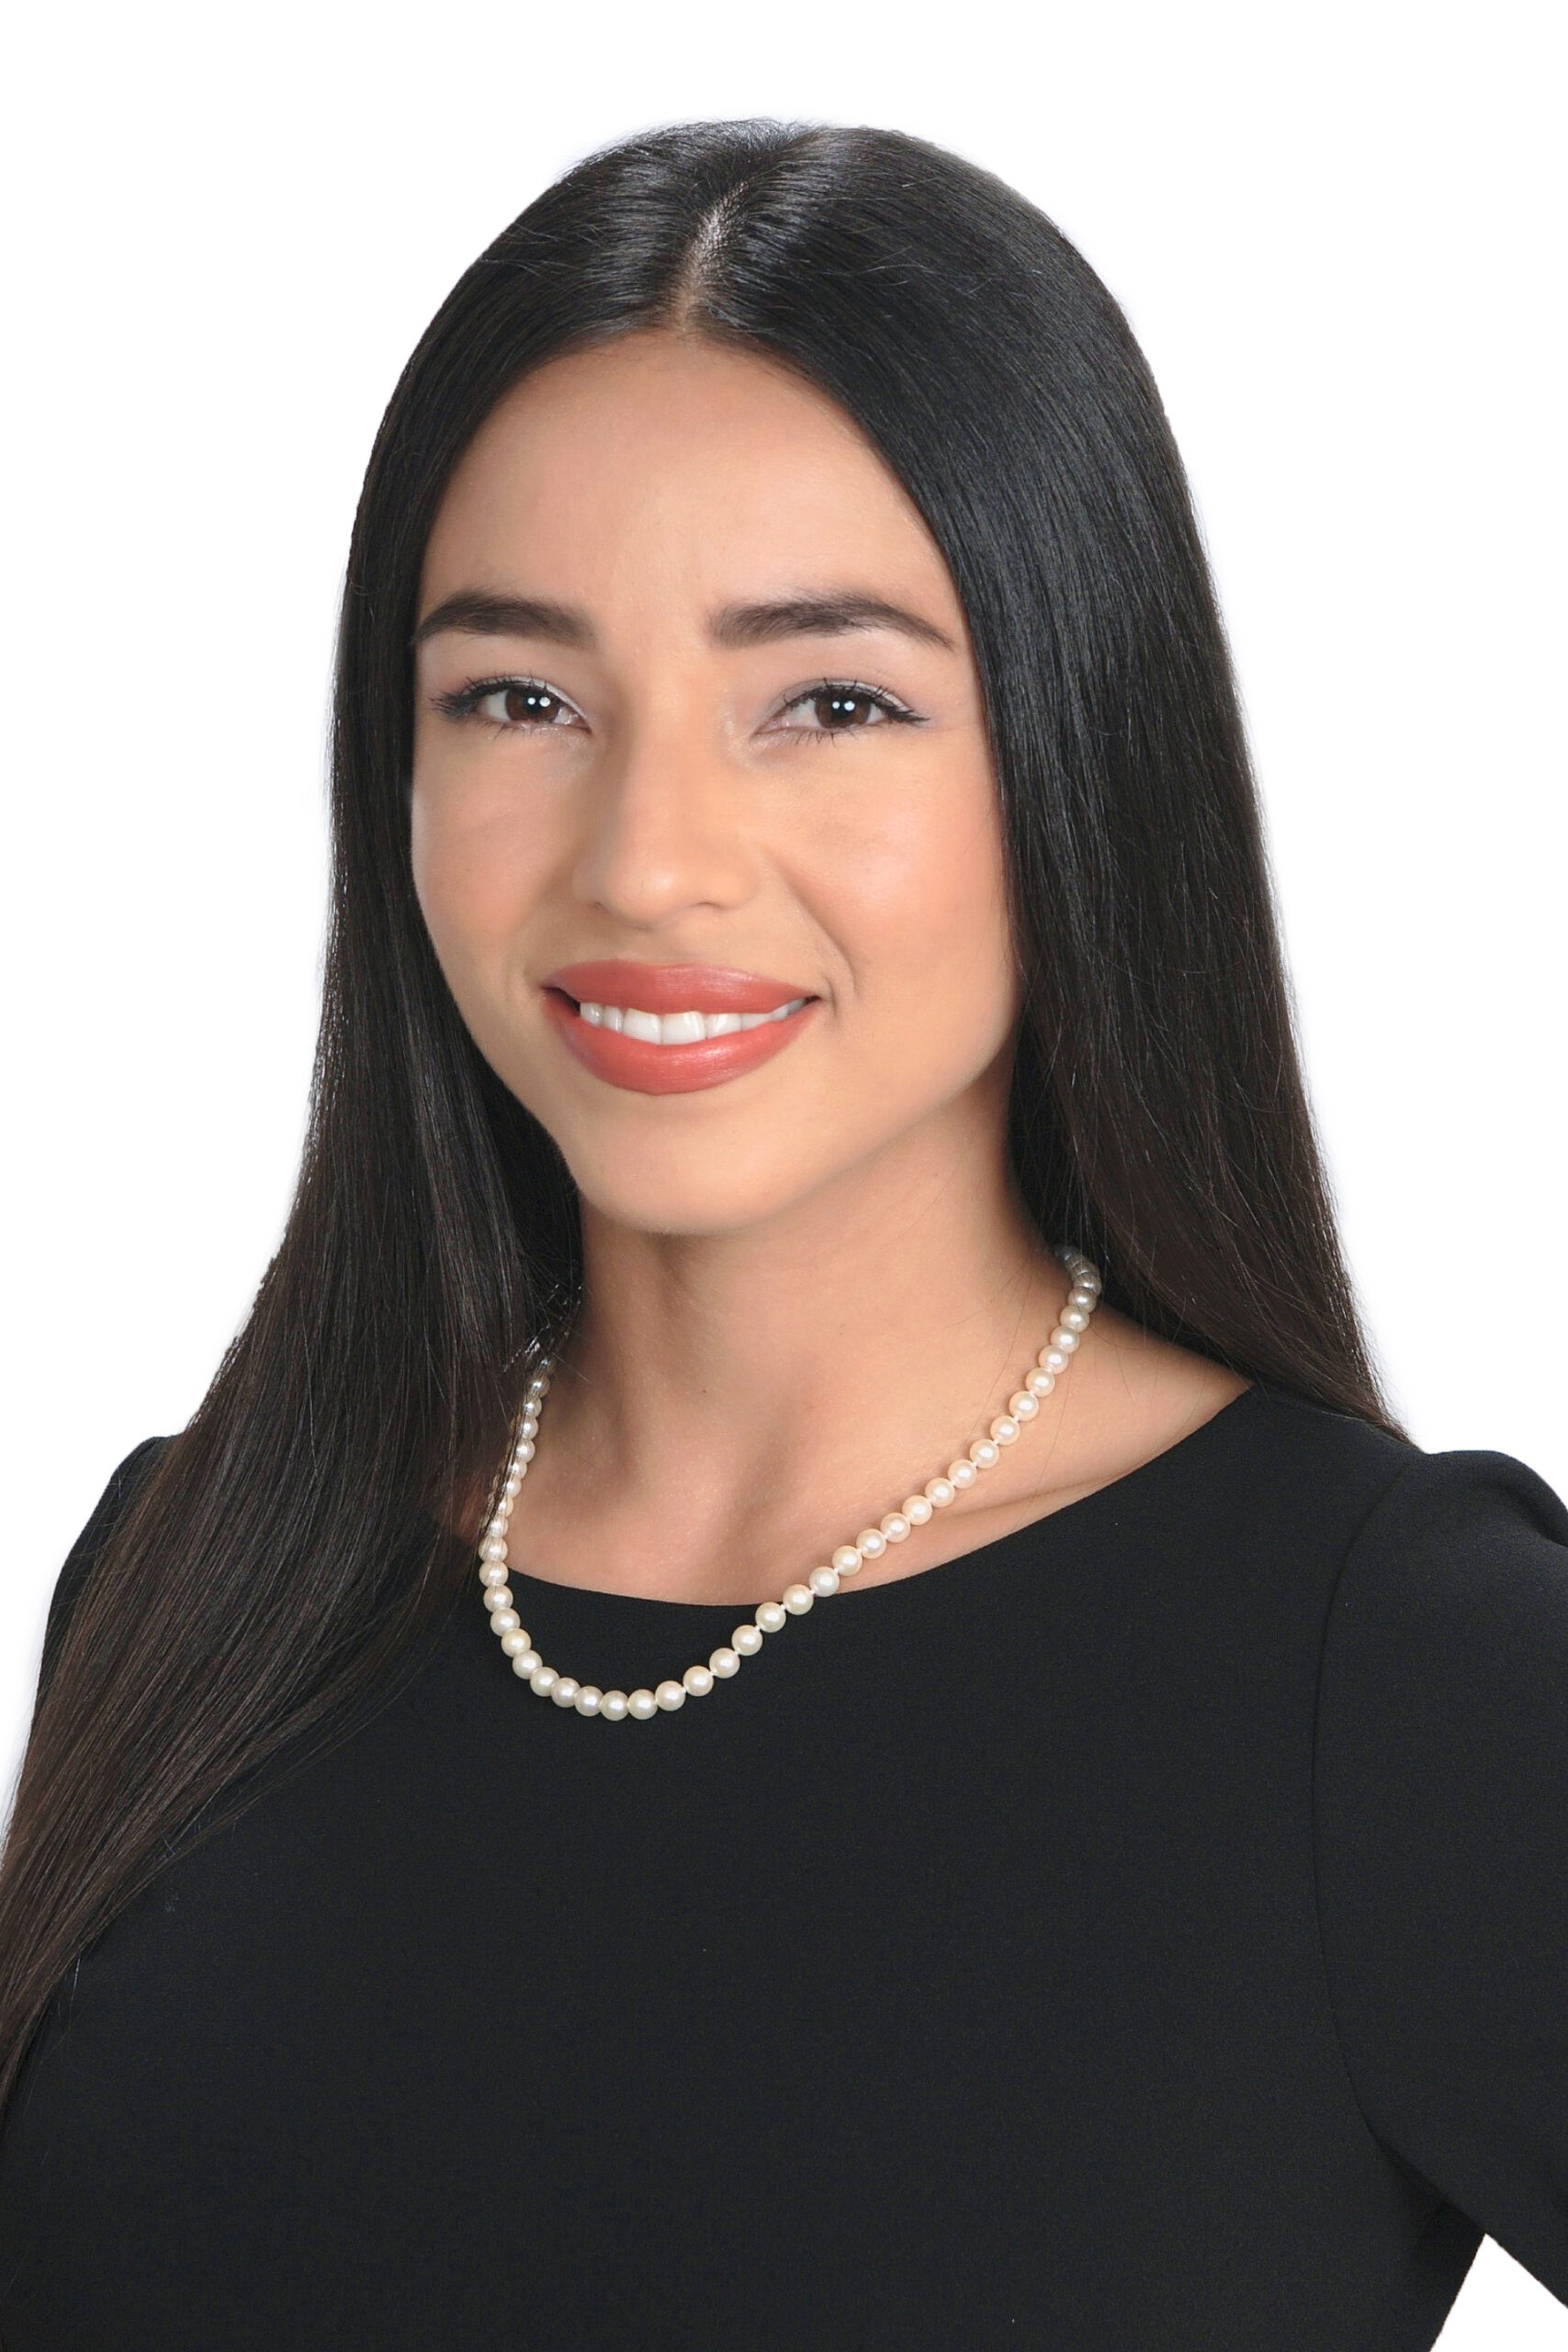 Carolina Esteban